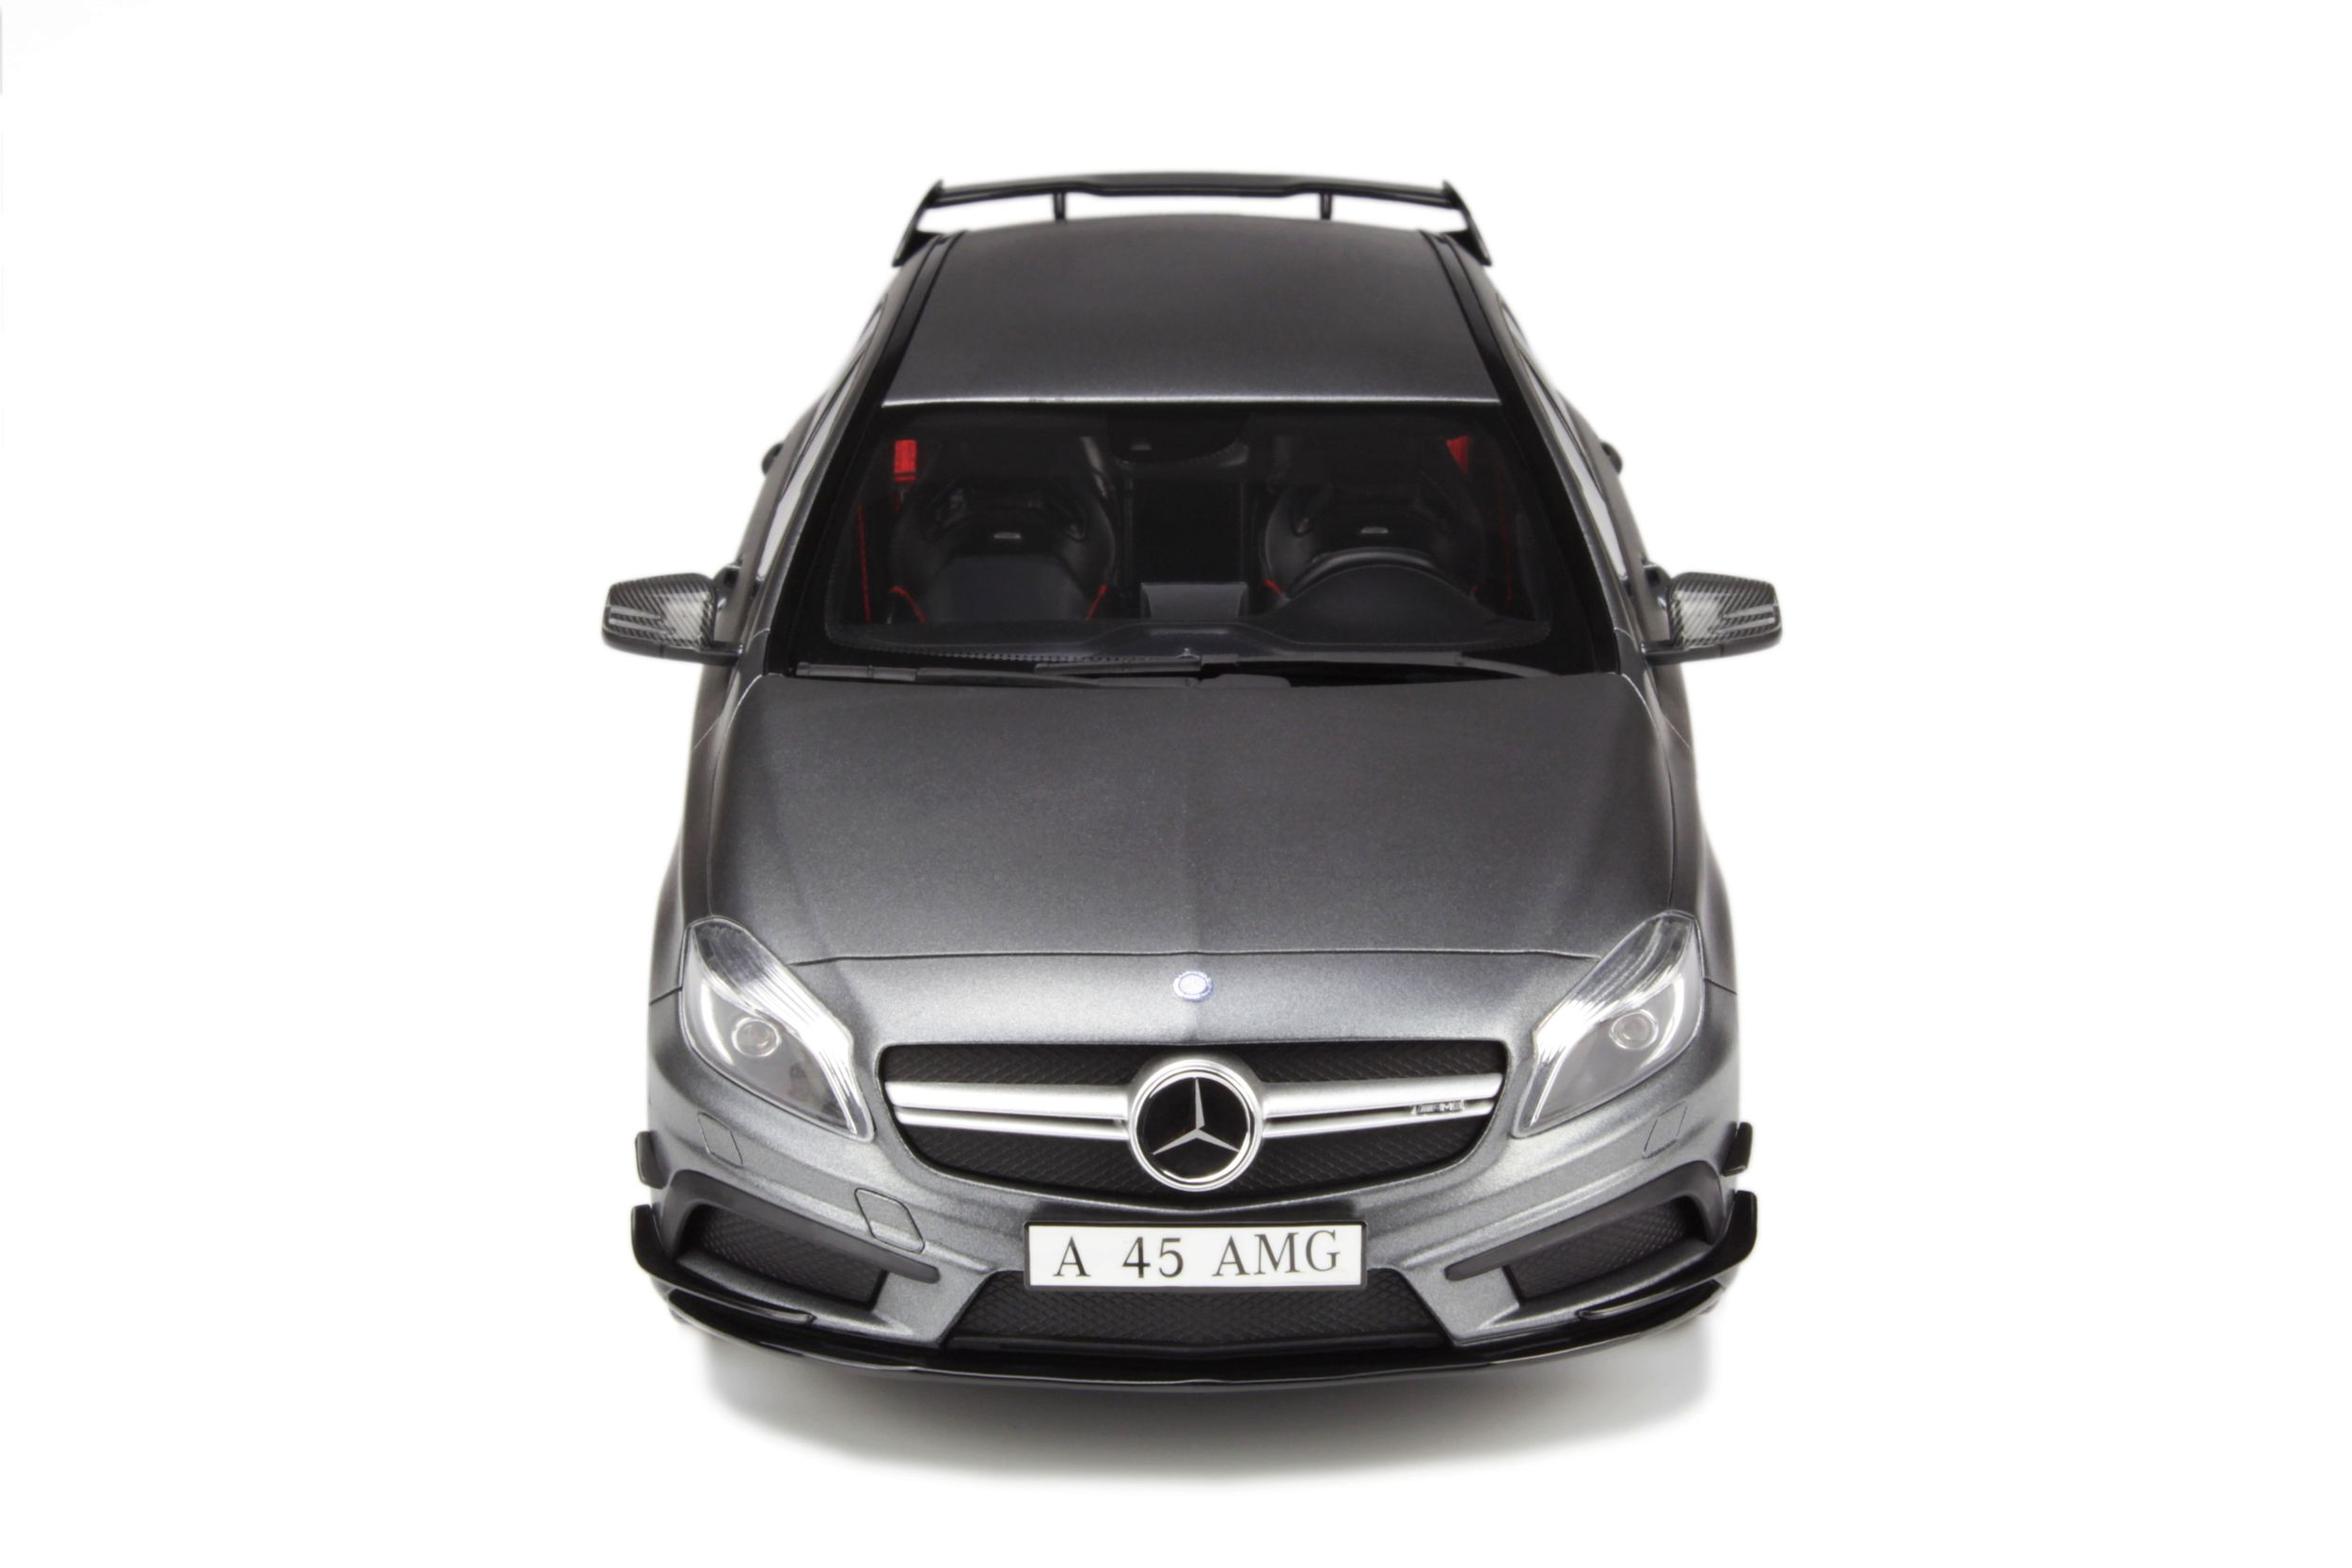 mercedes benz a45 amg voiture miniature de collection gt spirit. Black Bedroom Furniture Sets. Home Design Ideas